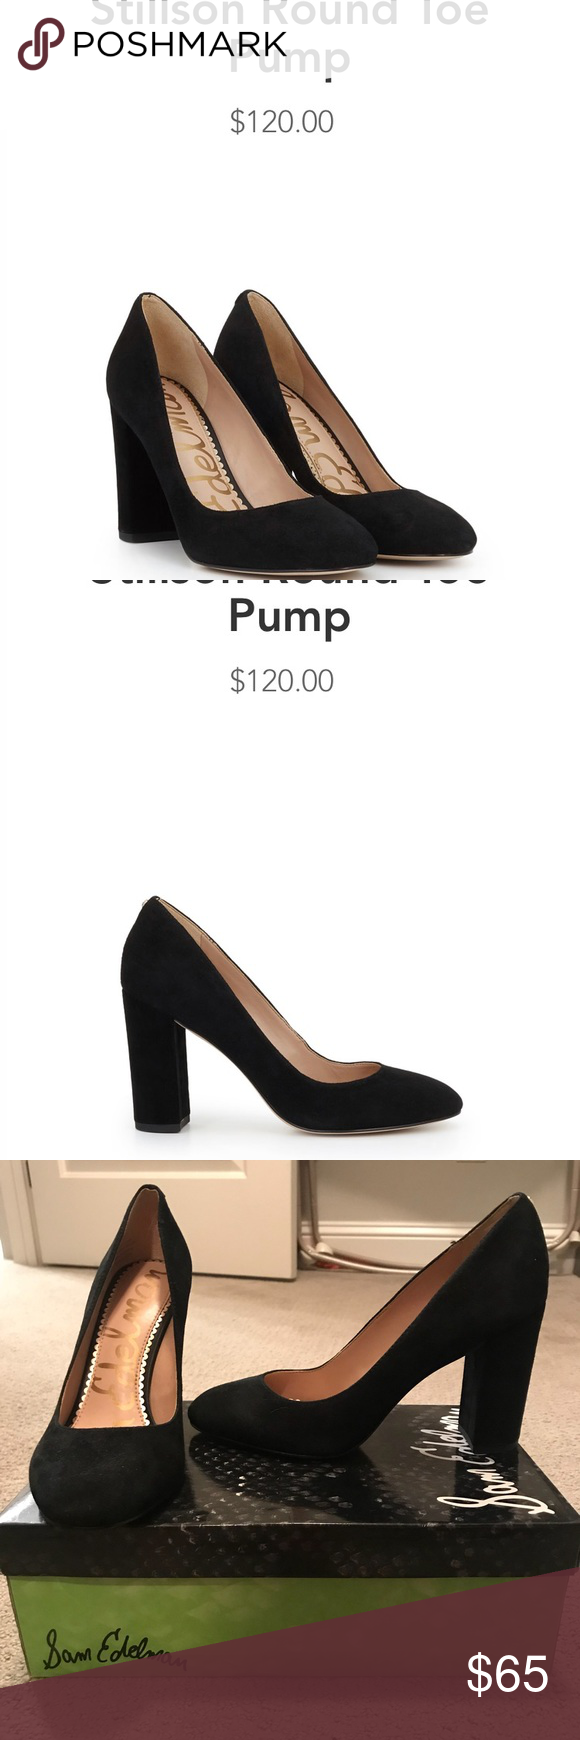 "e762ec54b0fc Sam Edelman Stillson Block Heel Pumps Brand new in box black suede round  toe block heel pumps. 3.5"" heel. Sam Edelman Shoes Heels"